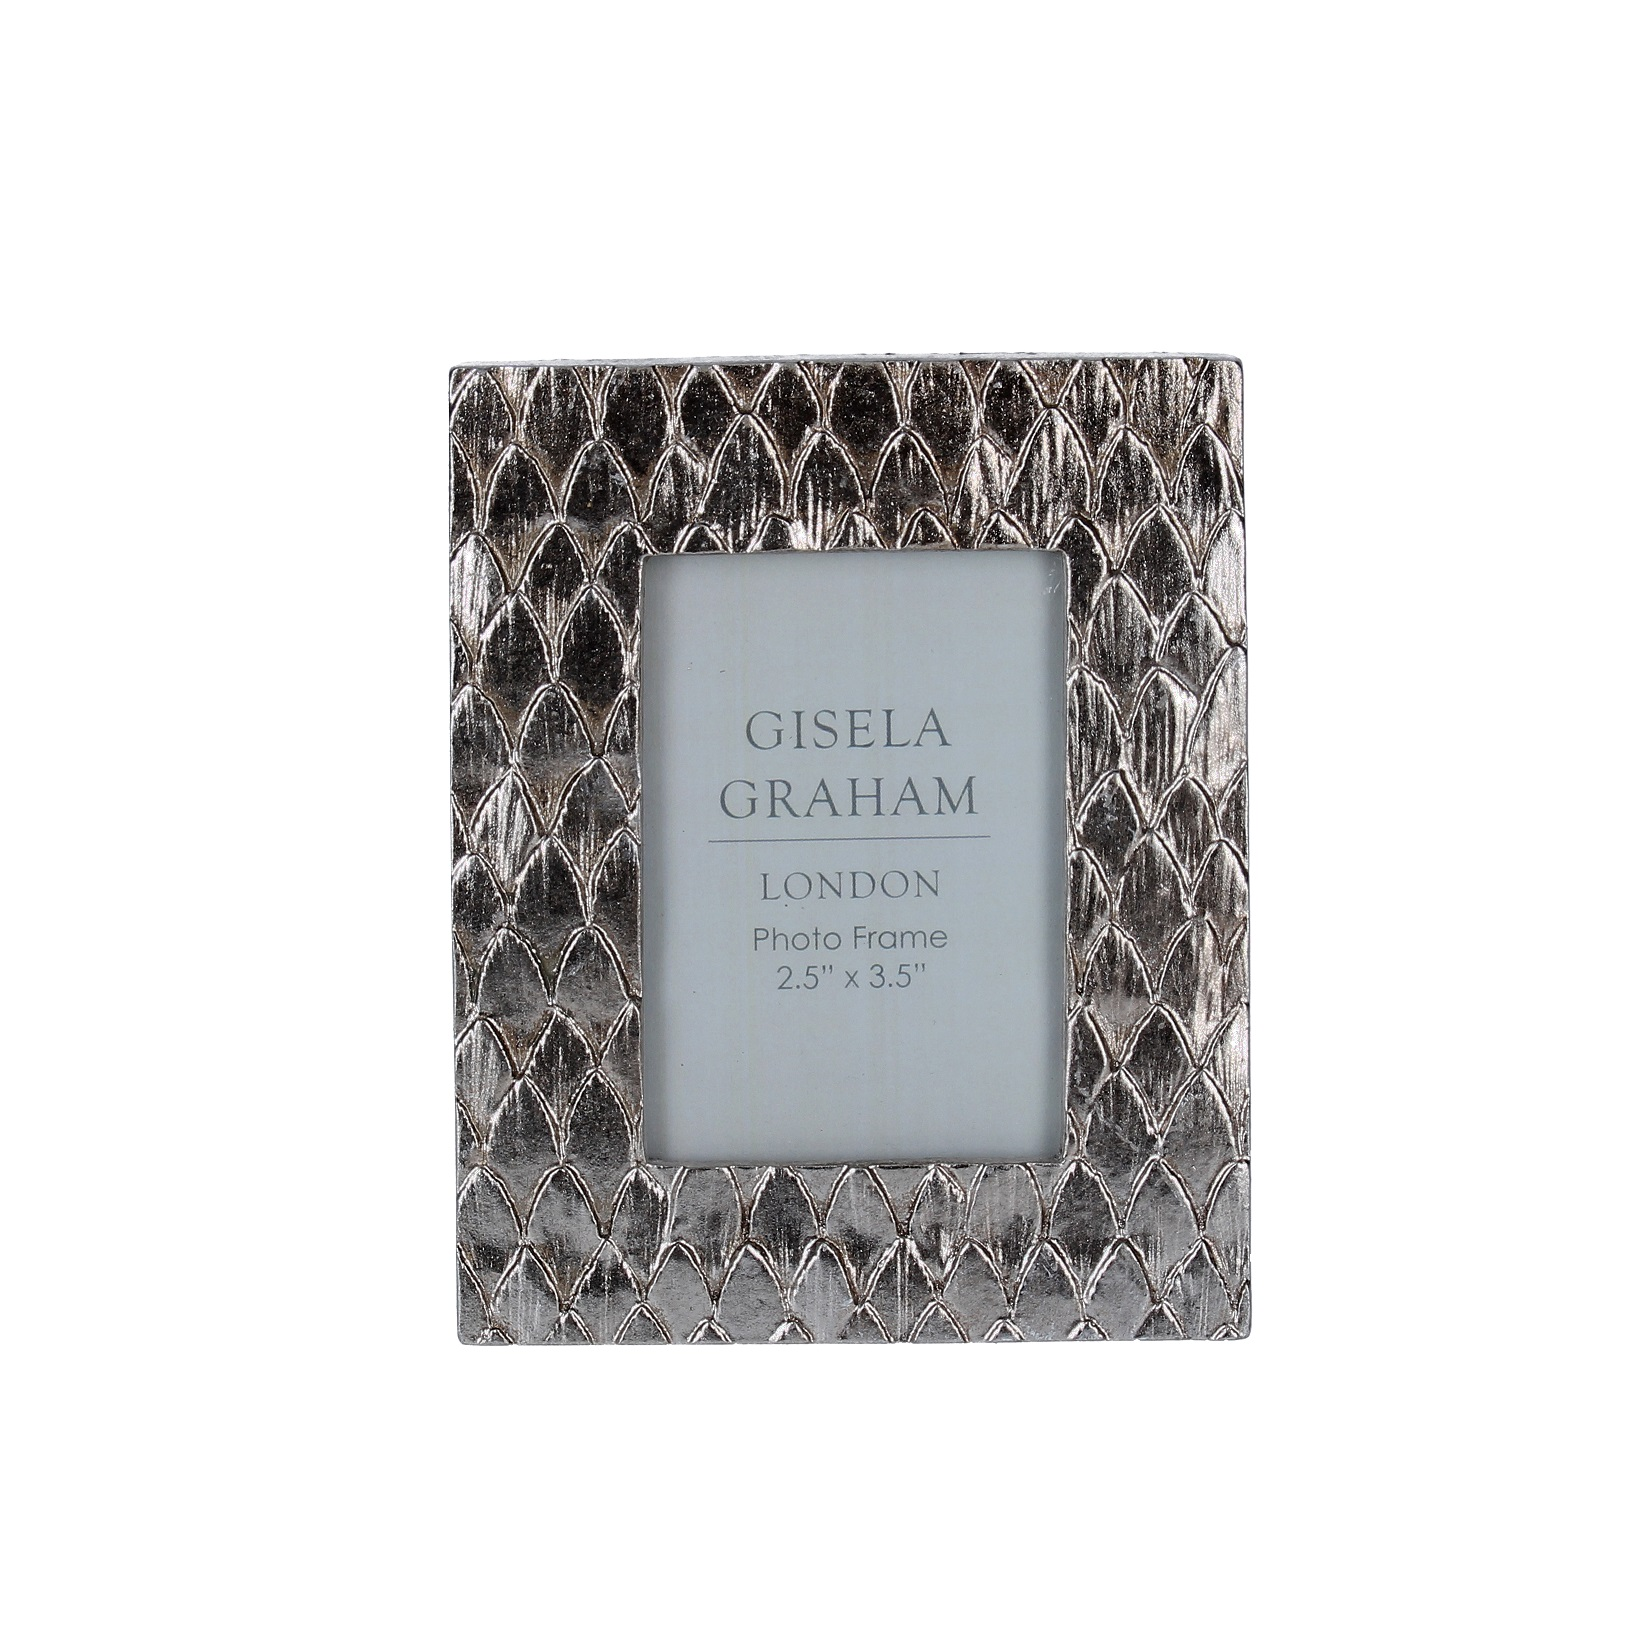 "Gisela Graham Silver Scale Frame 2.5"" x 3.5"""